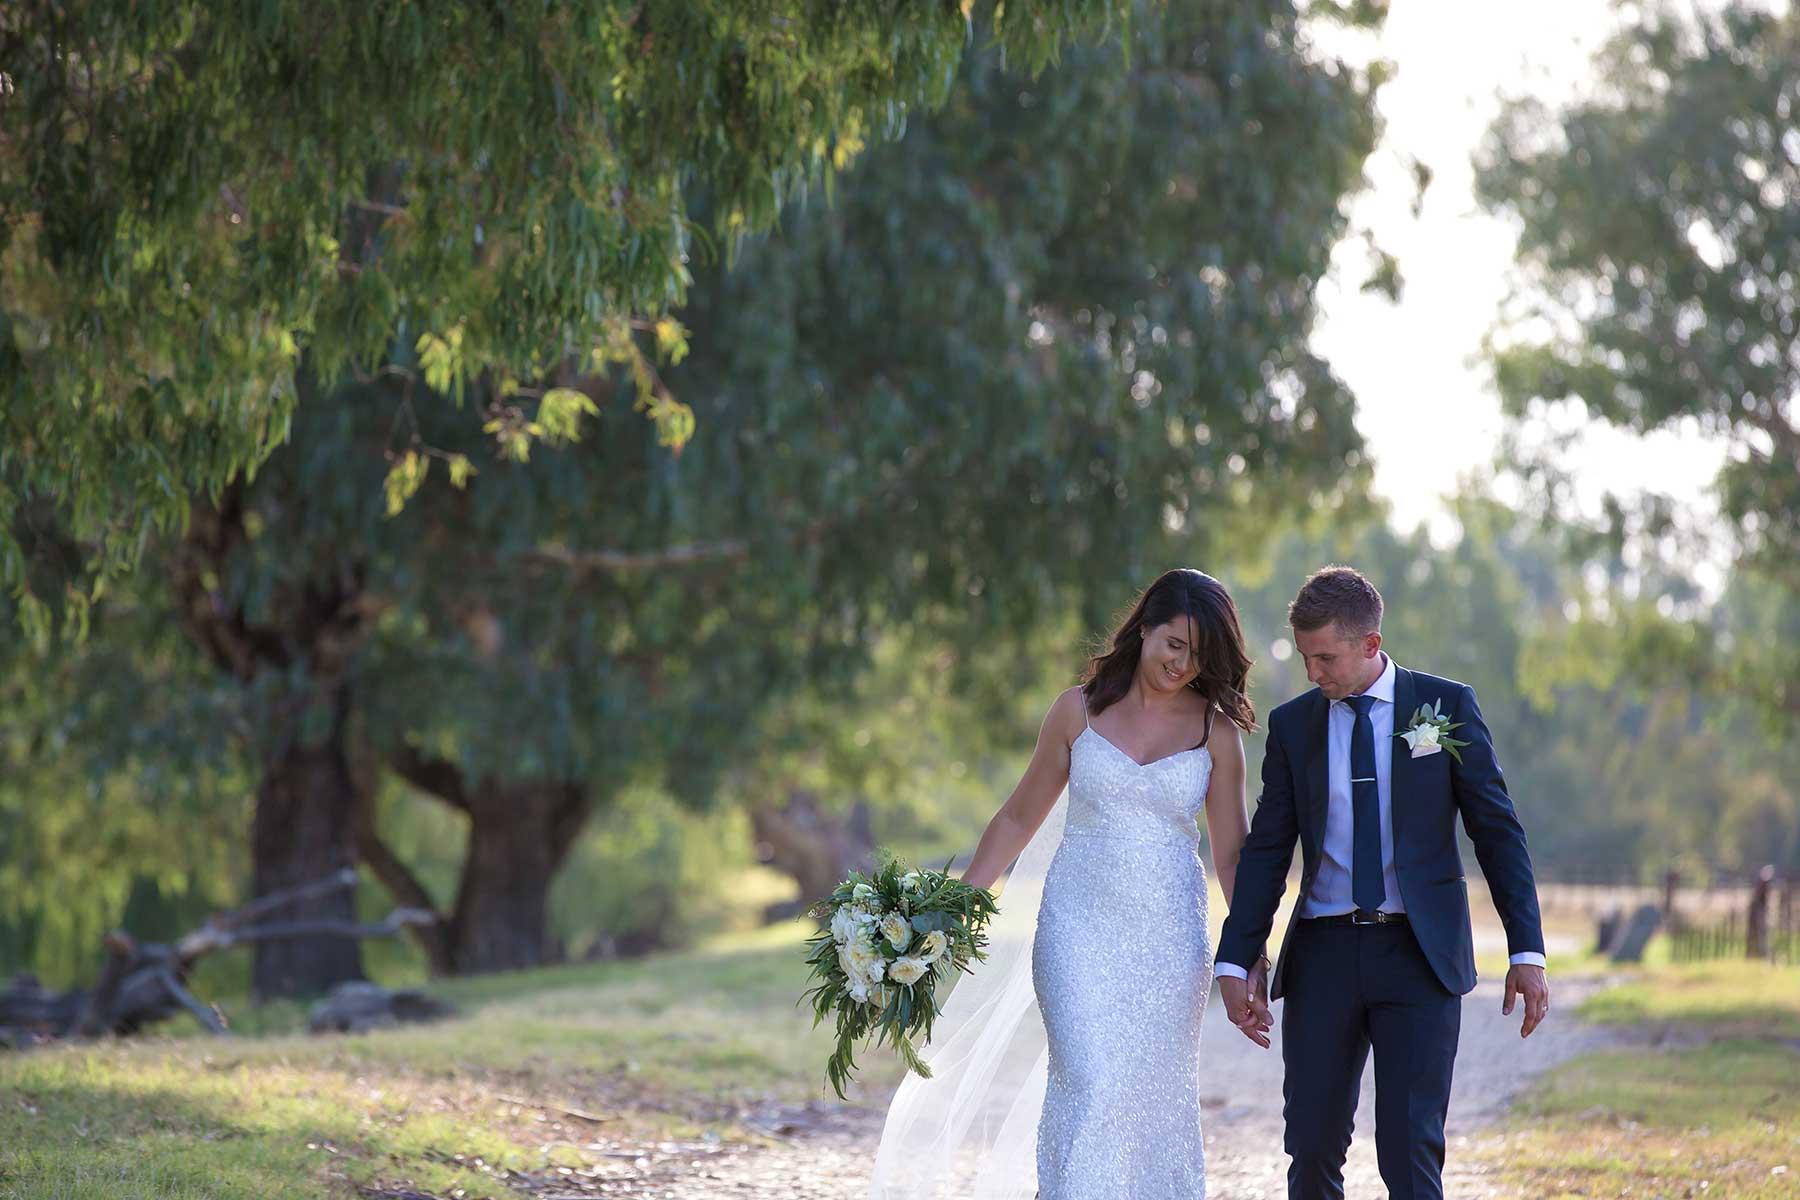 Albury Wodonga Wedding Photography at Willowbank Albury. By Albury and Melbourne Wedding photographer Jason Robins